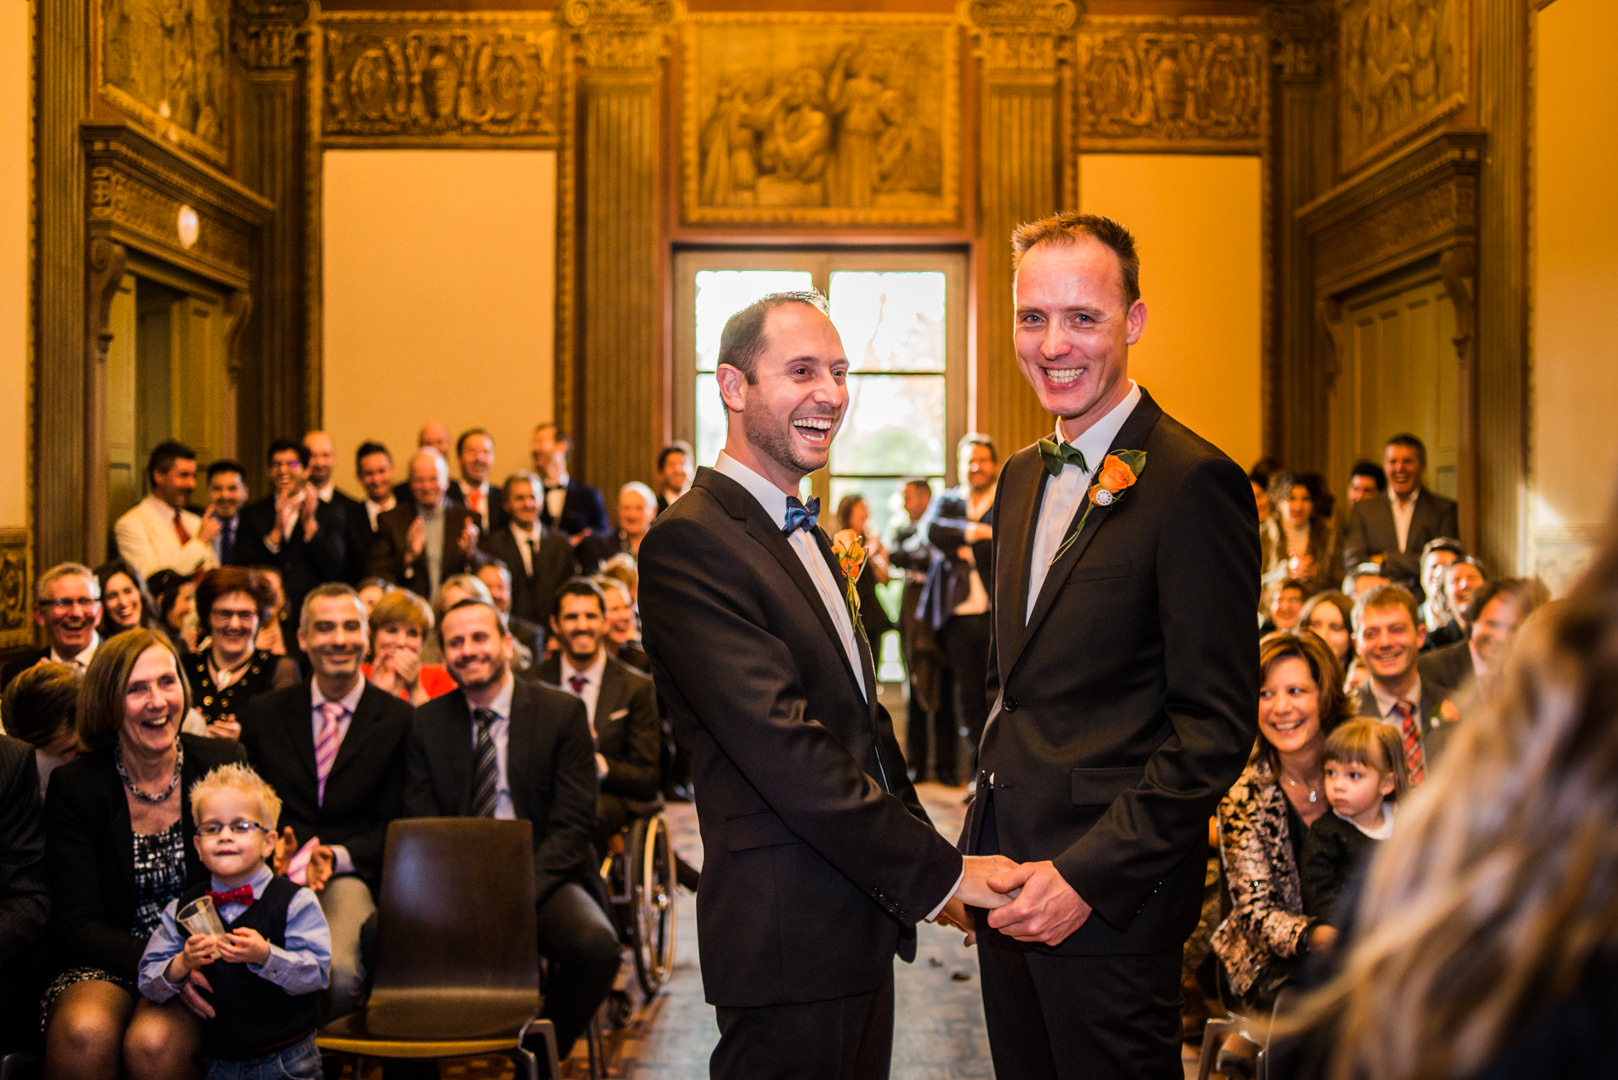 Same-sex-wedding-barcelona-boda- gay-samesex-engagement-Rafael-Torres-fotografo-bodas-sevilla-madrid-barcelona-wedding-photographer--12.jpg